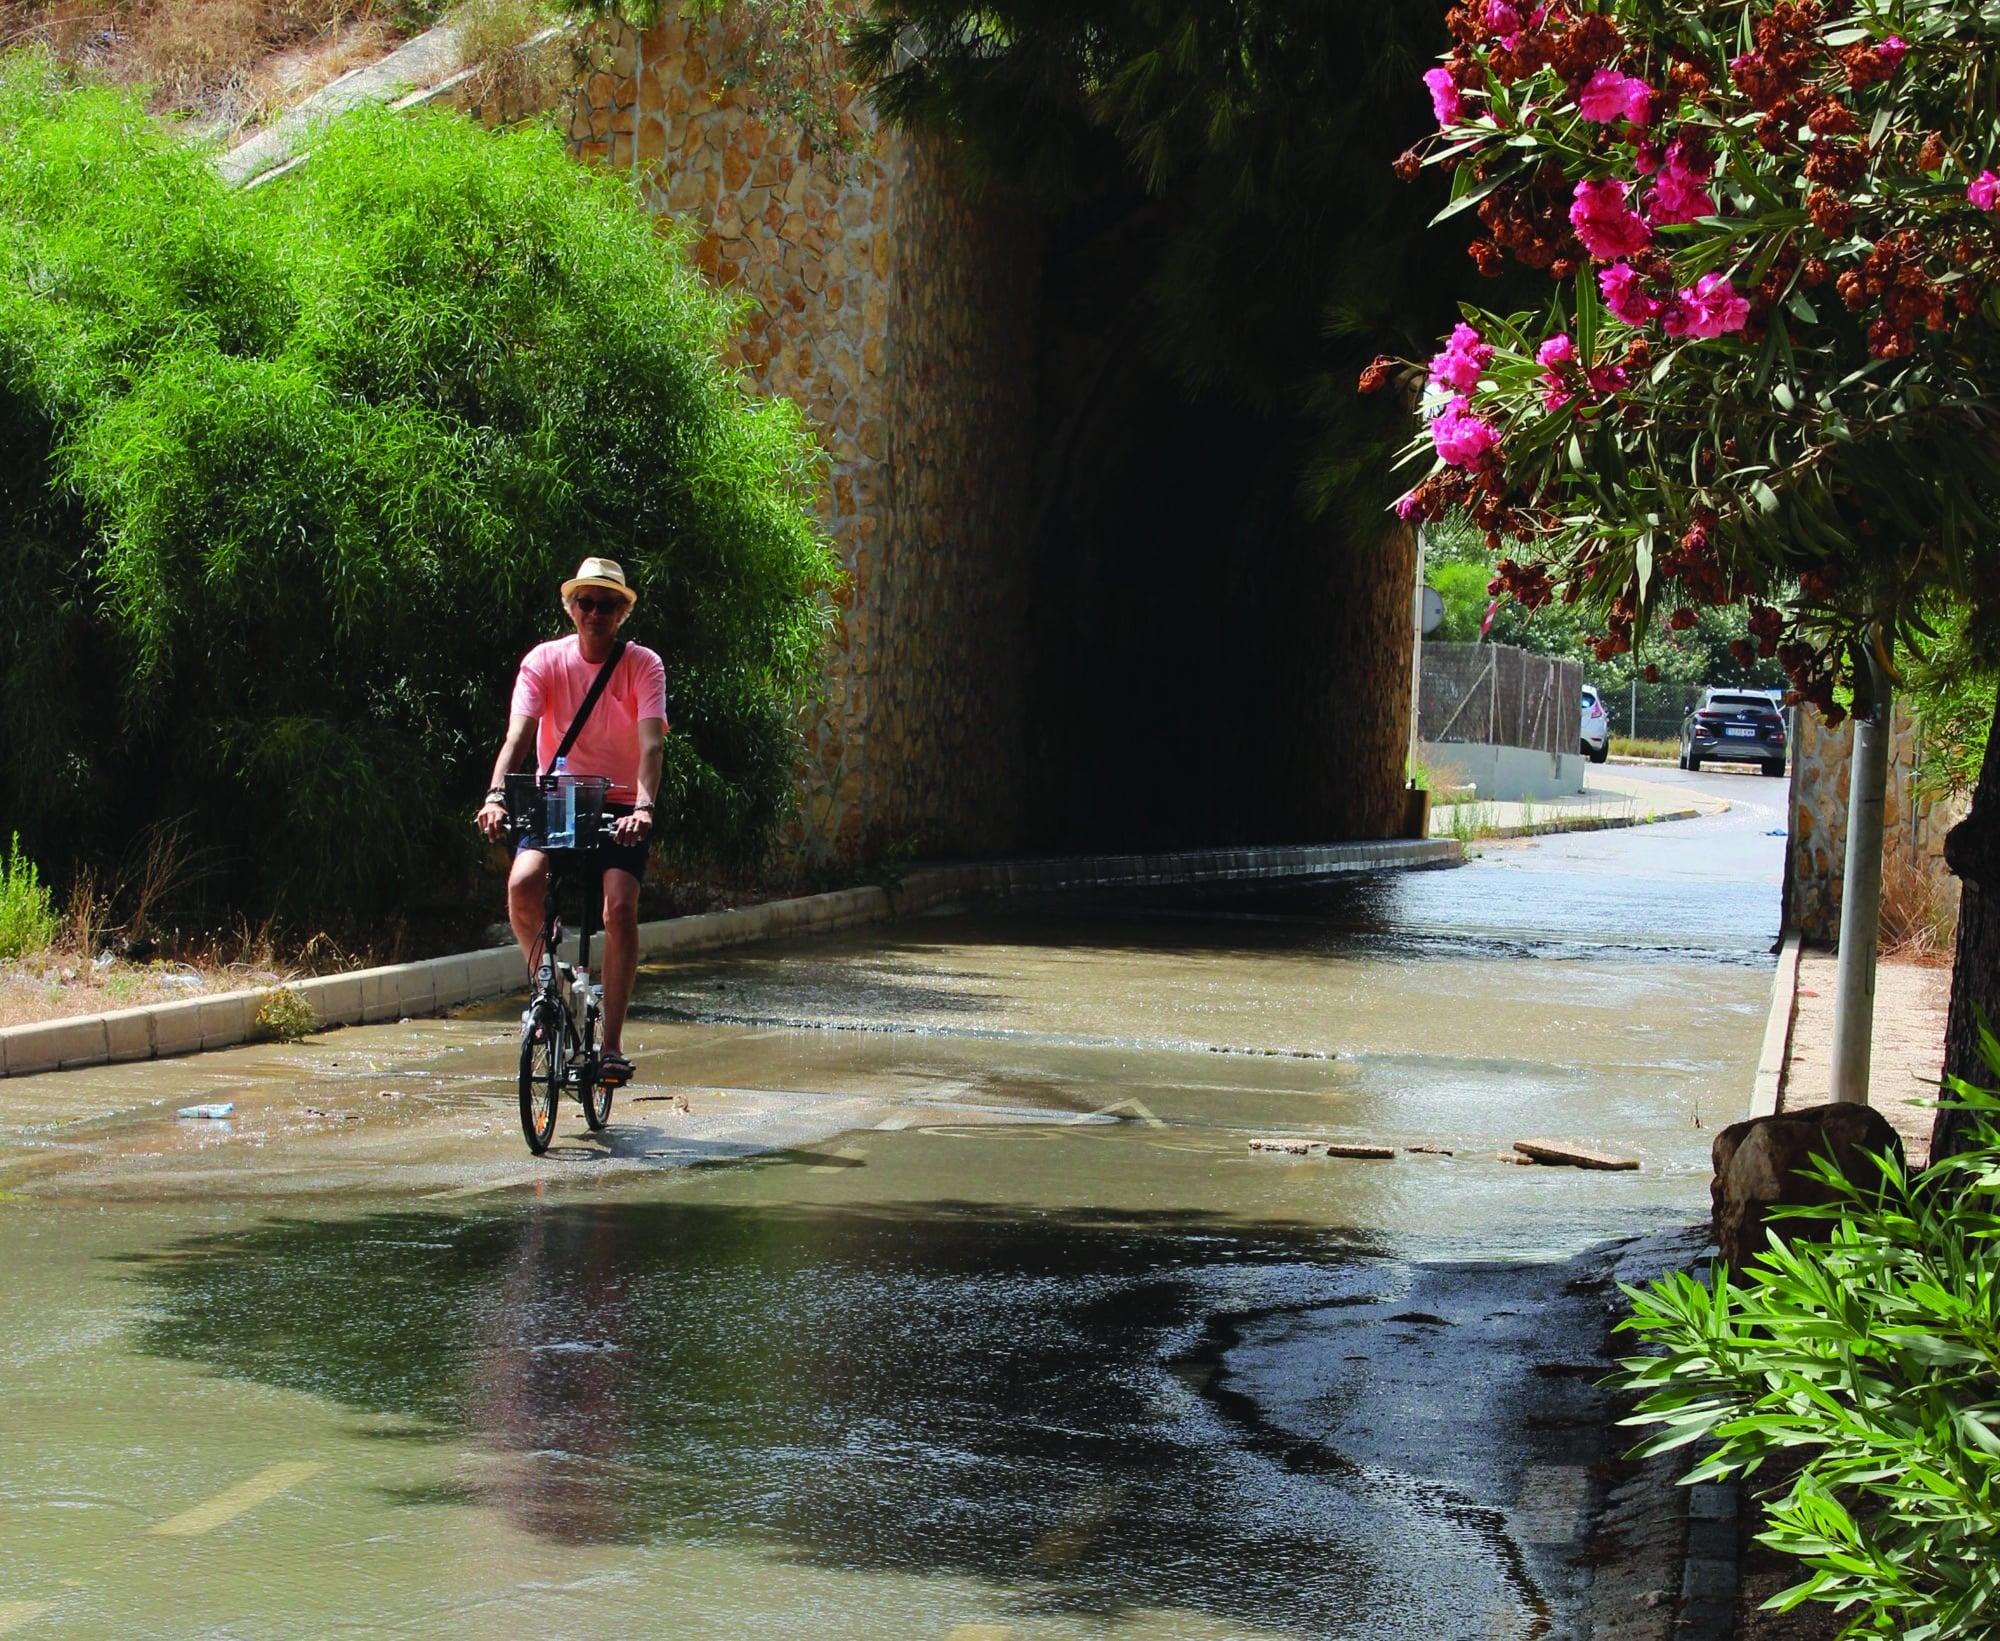 A cyclist pedalling through the sewage in La Zenia Village